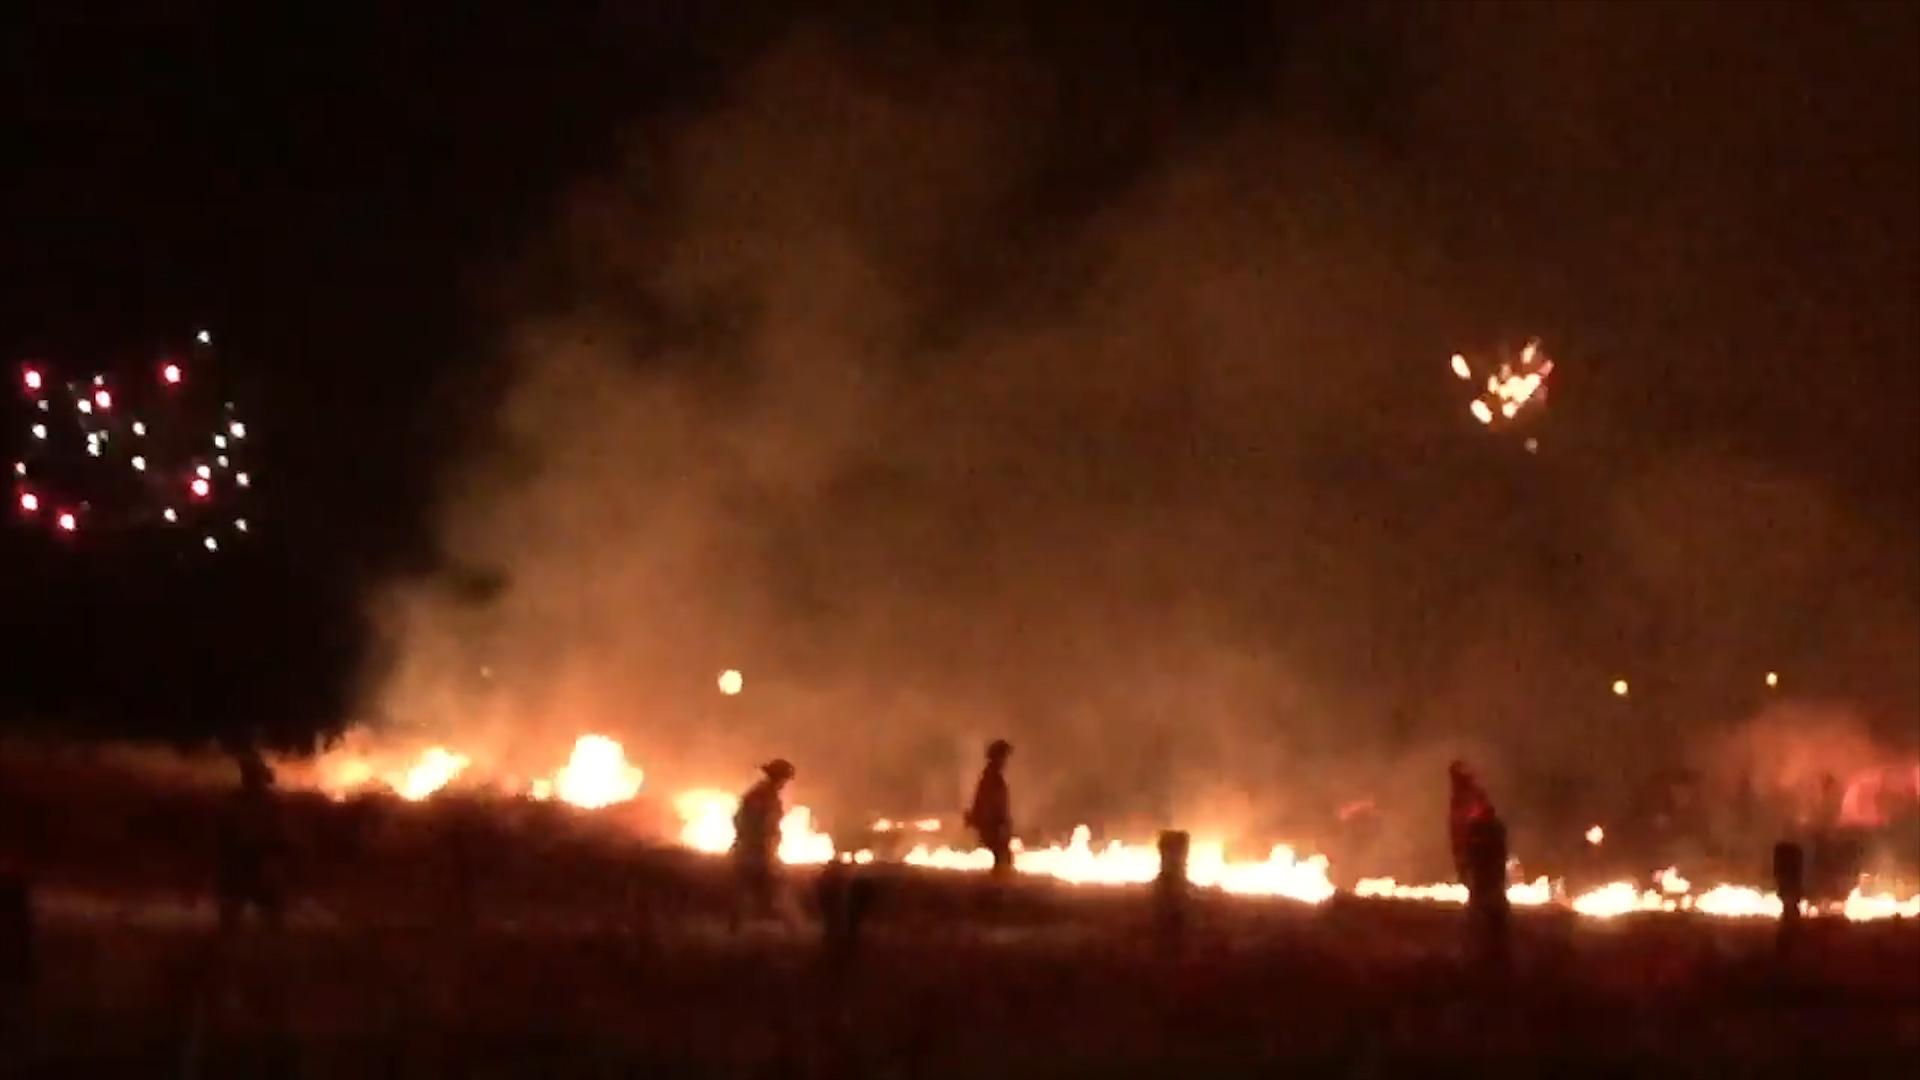 Video captures Sacramento firefighters battling blazes as fireworks ...